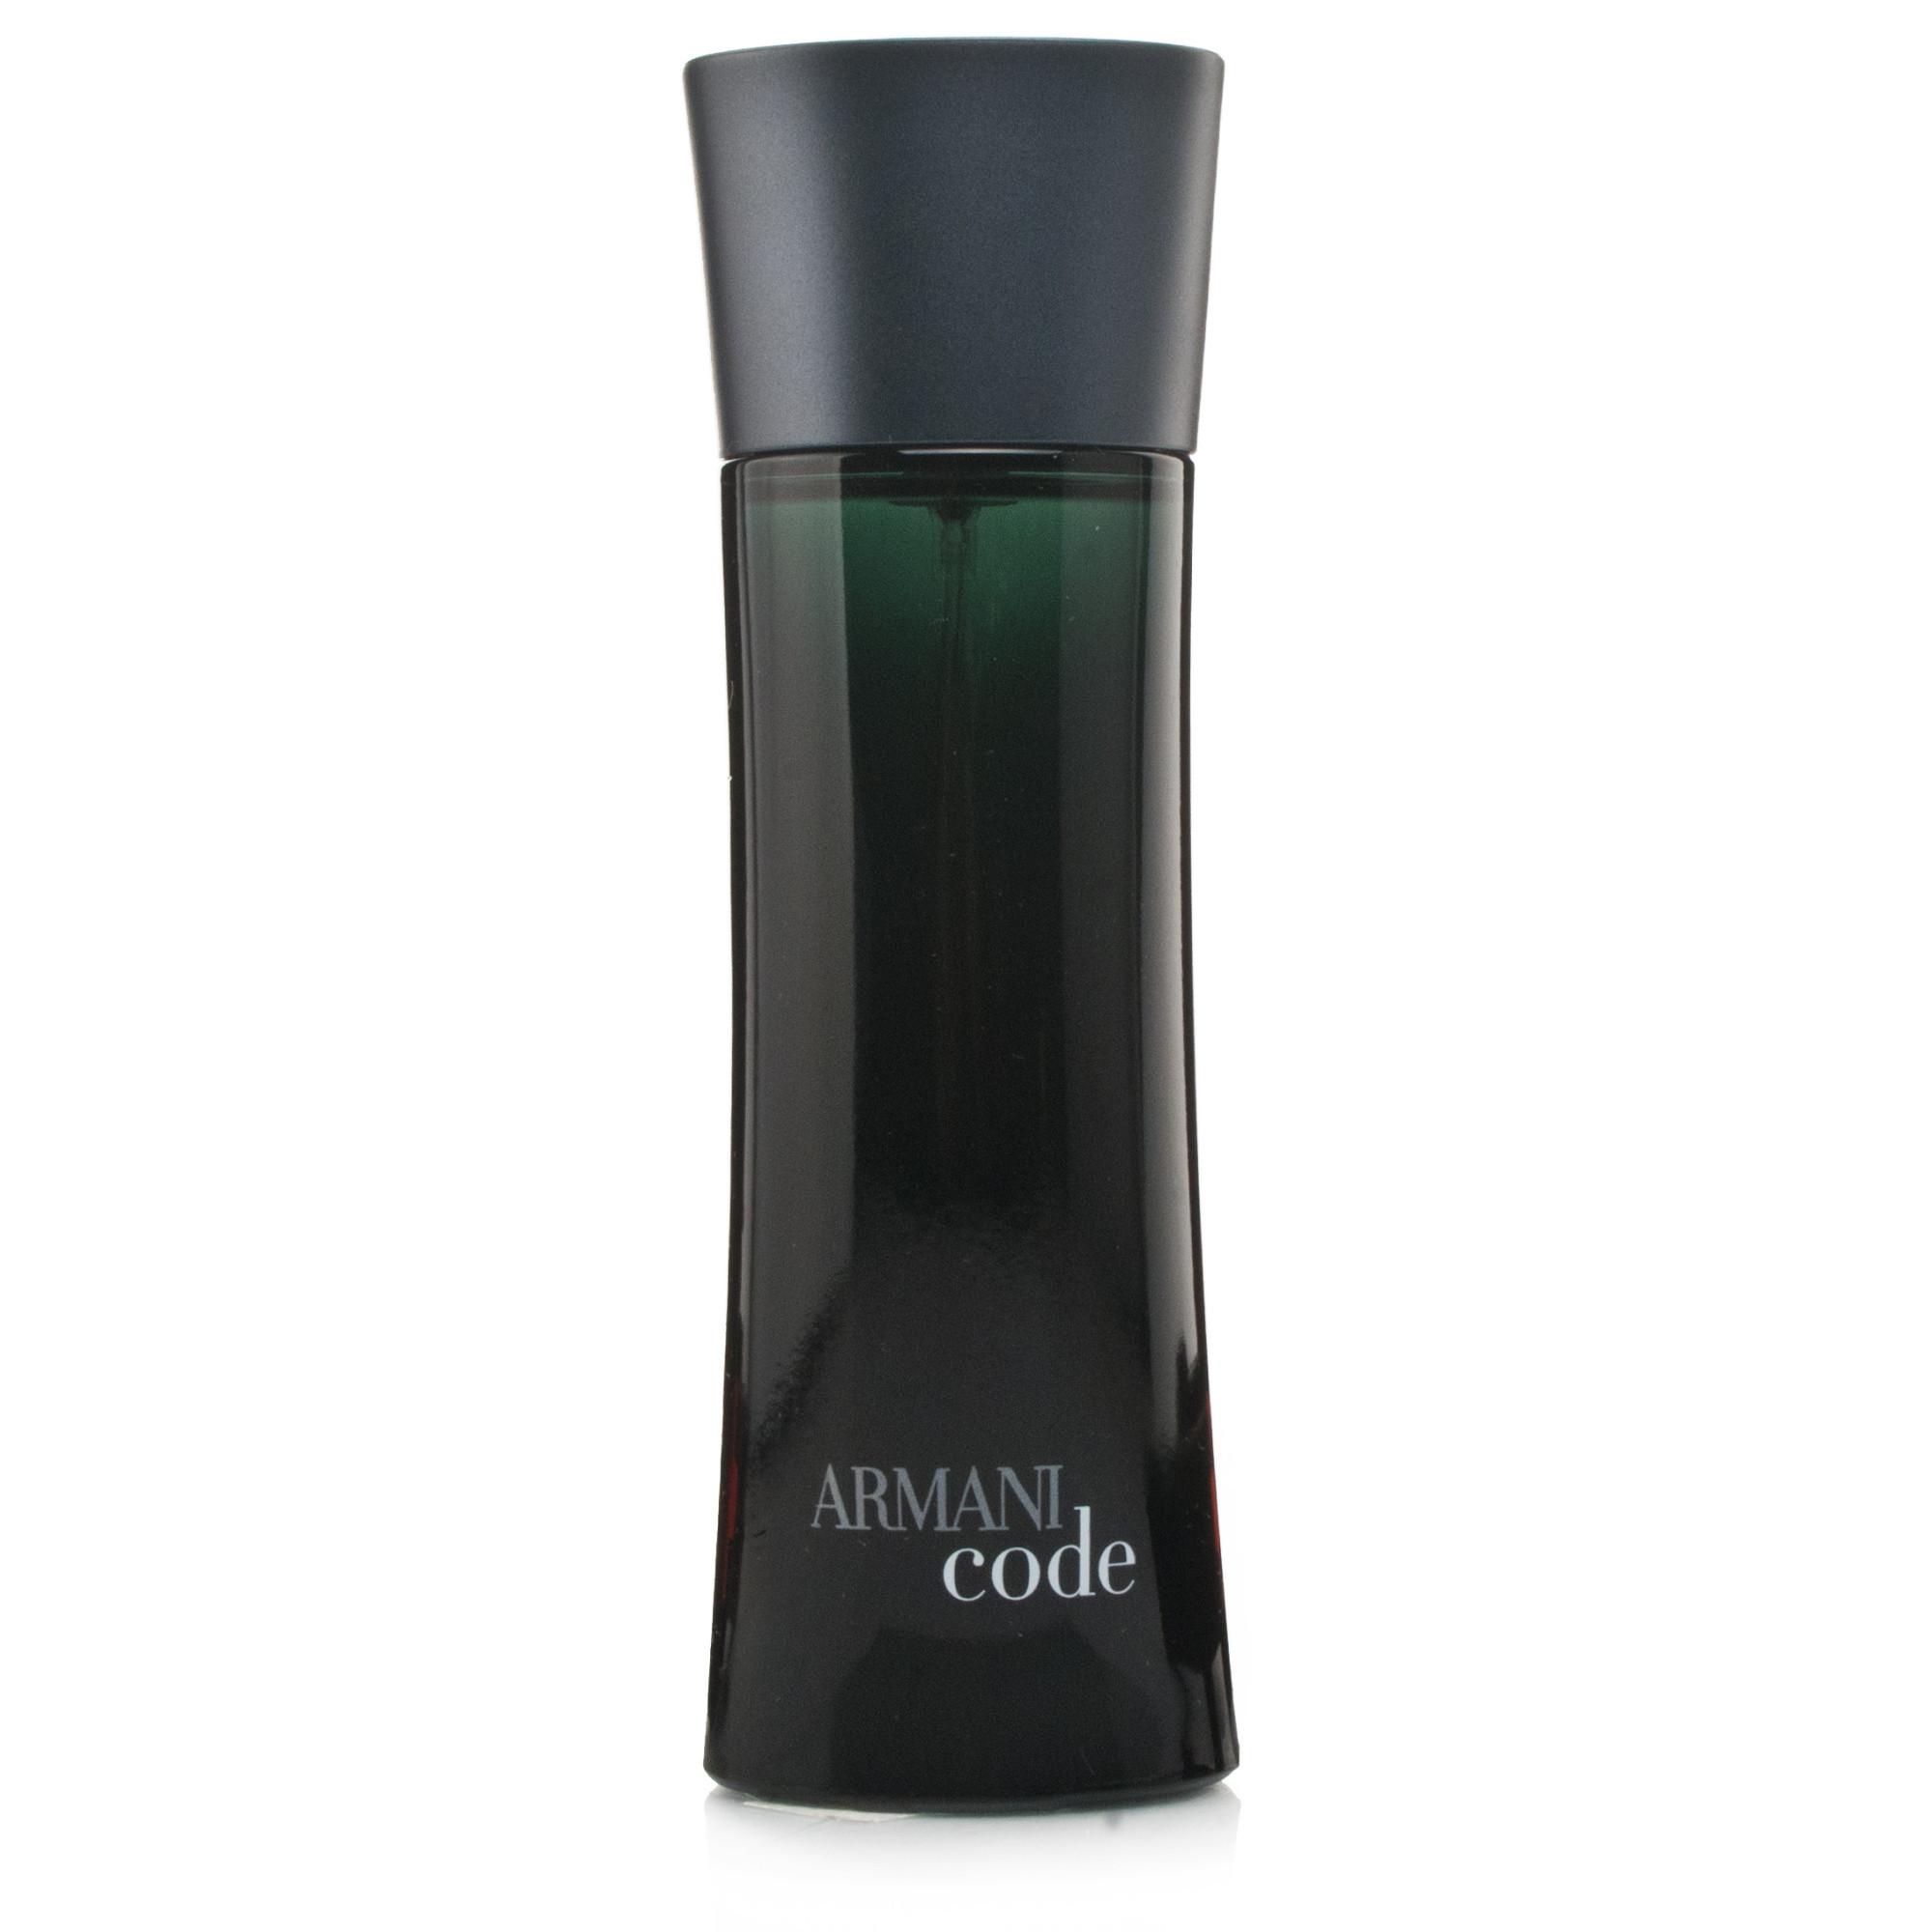 giorgio armani code pour homme edt 75ml fragrances. Black Bedroom Furniture Sets. Home Design Ideas